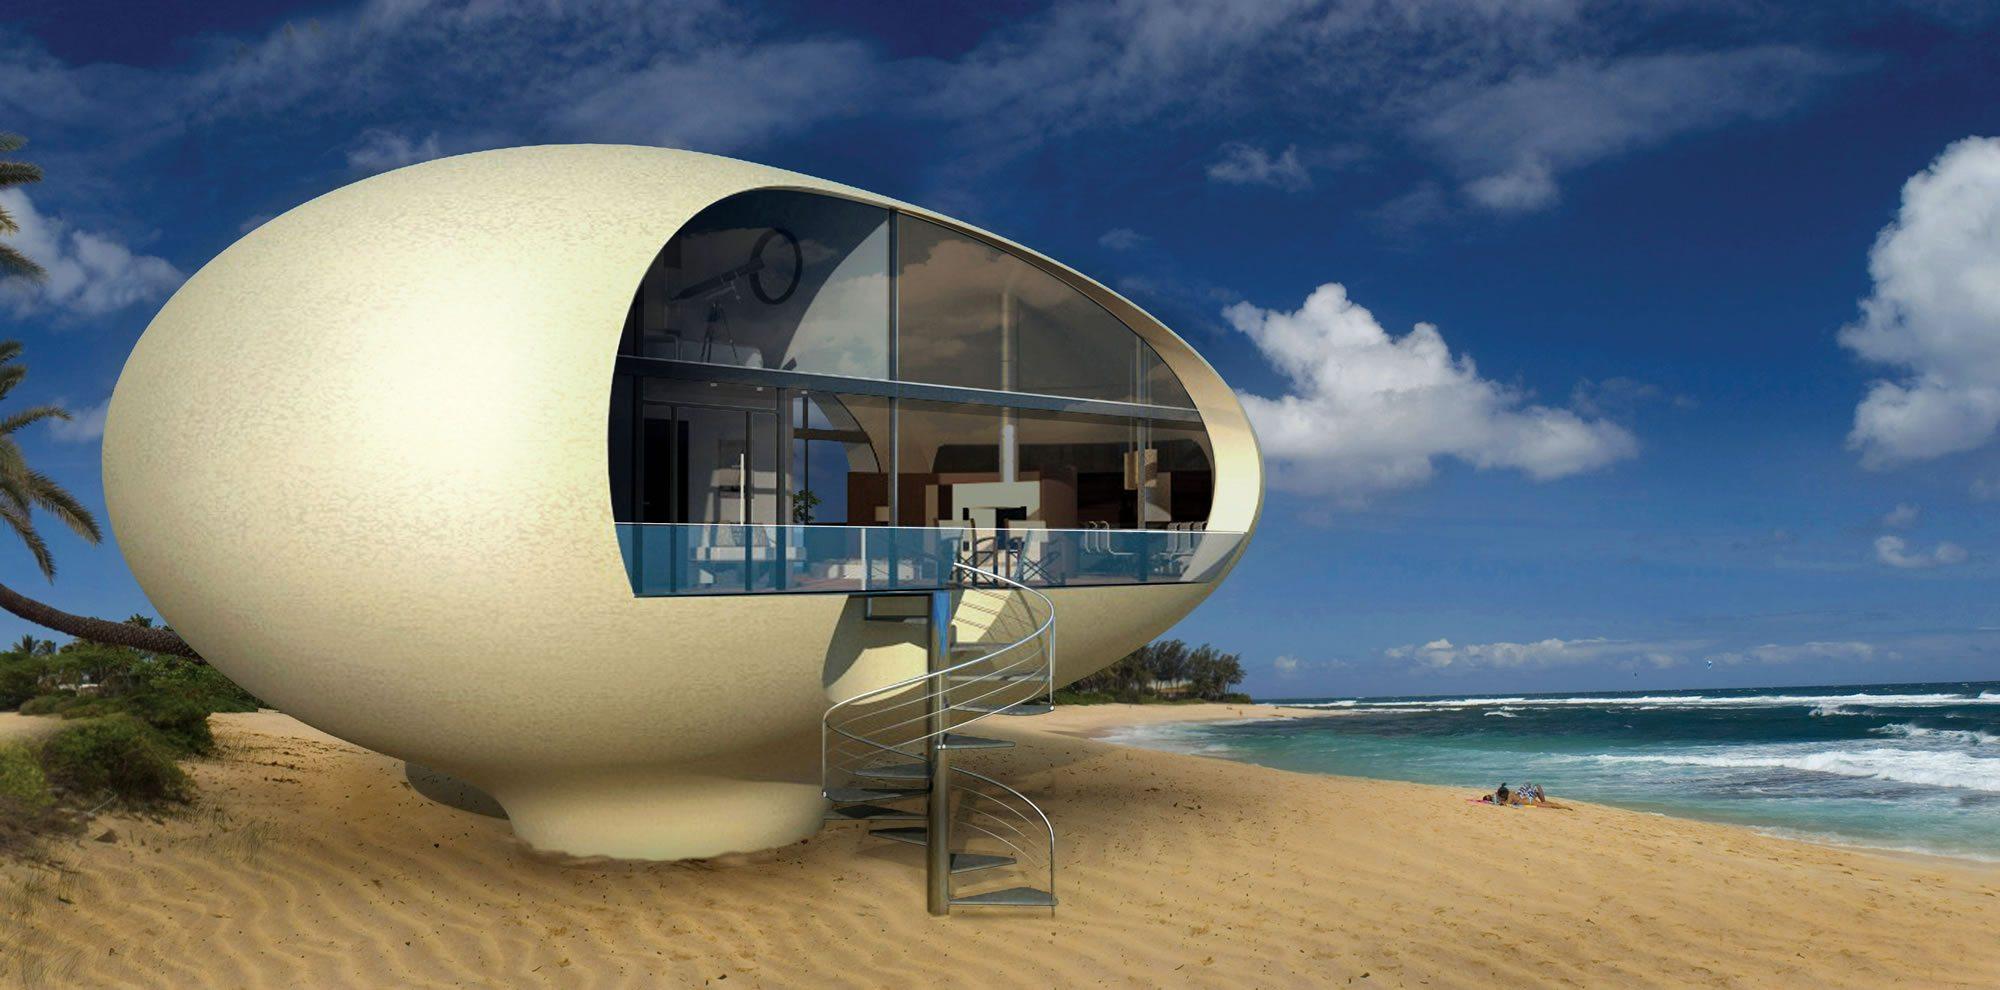 La cabaña de playa Sea-Suite. Foto: BMT Asia Pacific